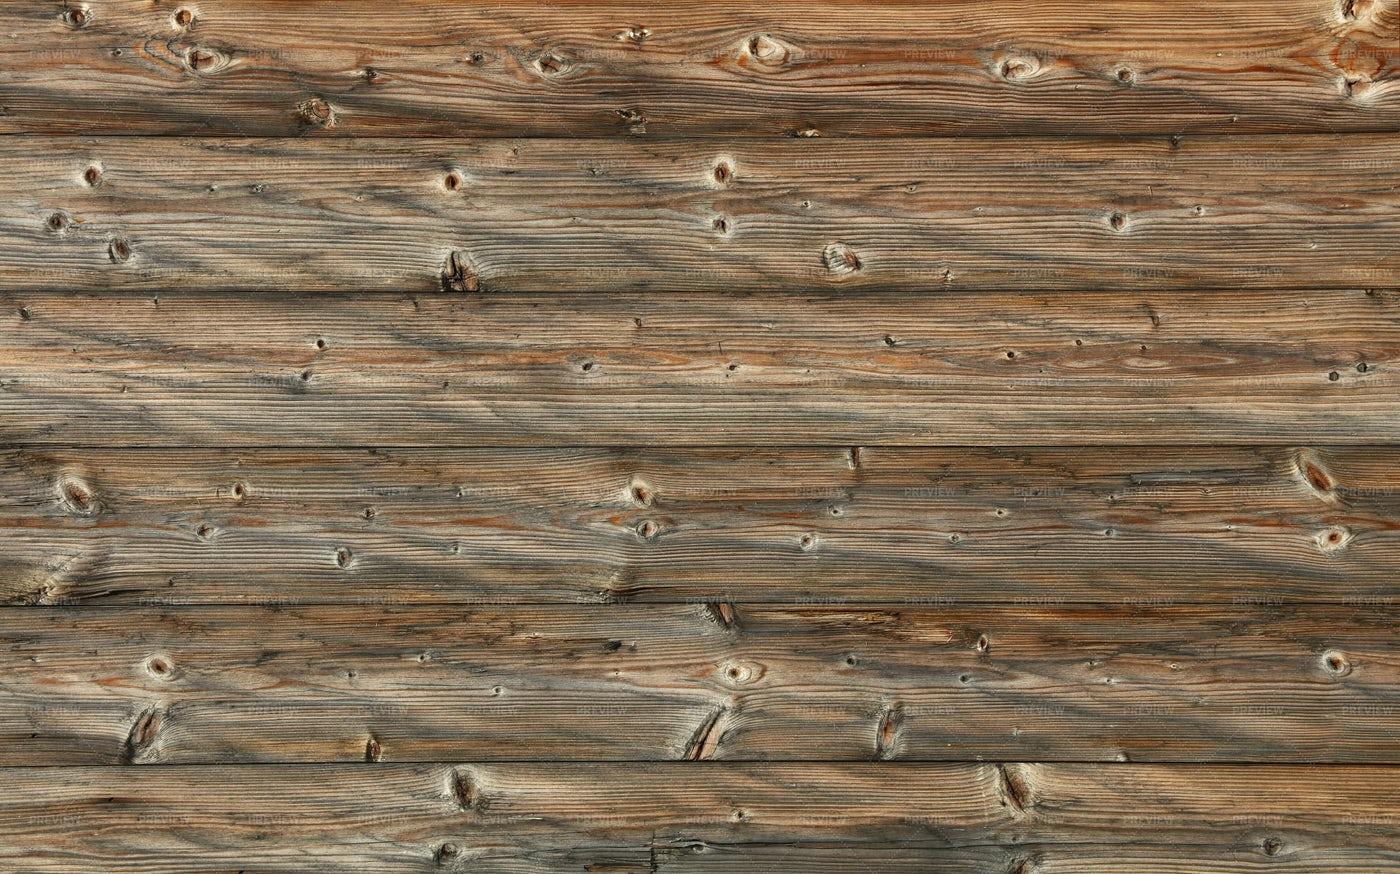 Uneven Wooden Planks: Stock Photos